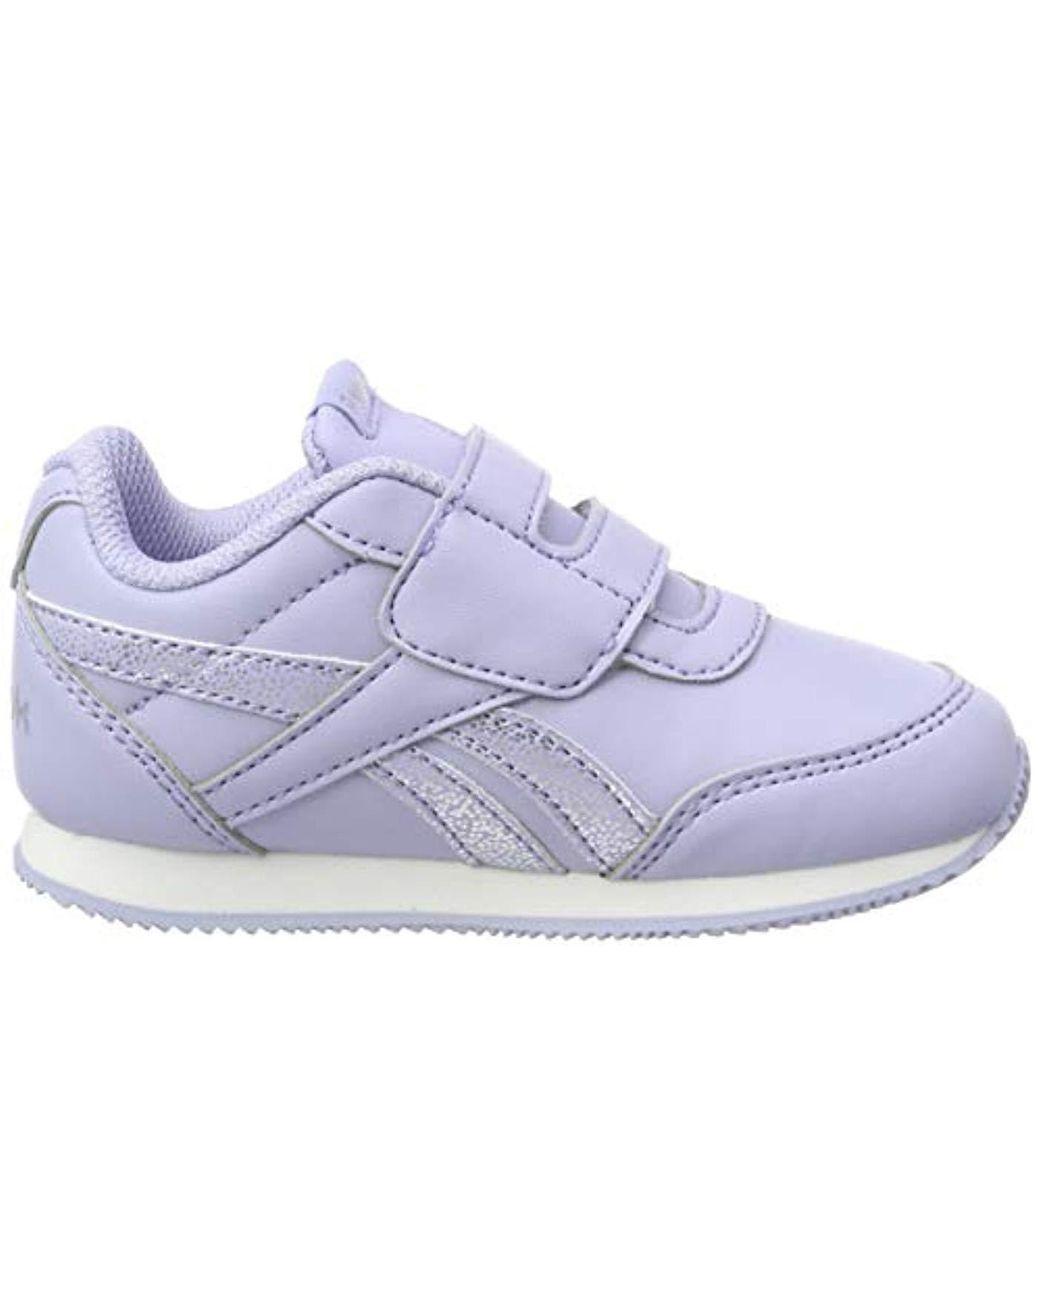 505c9009e02cd Reebok Infant s Royal Cljog 2 Kc Fitness Shoes